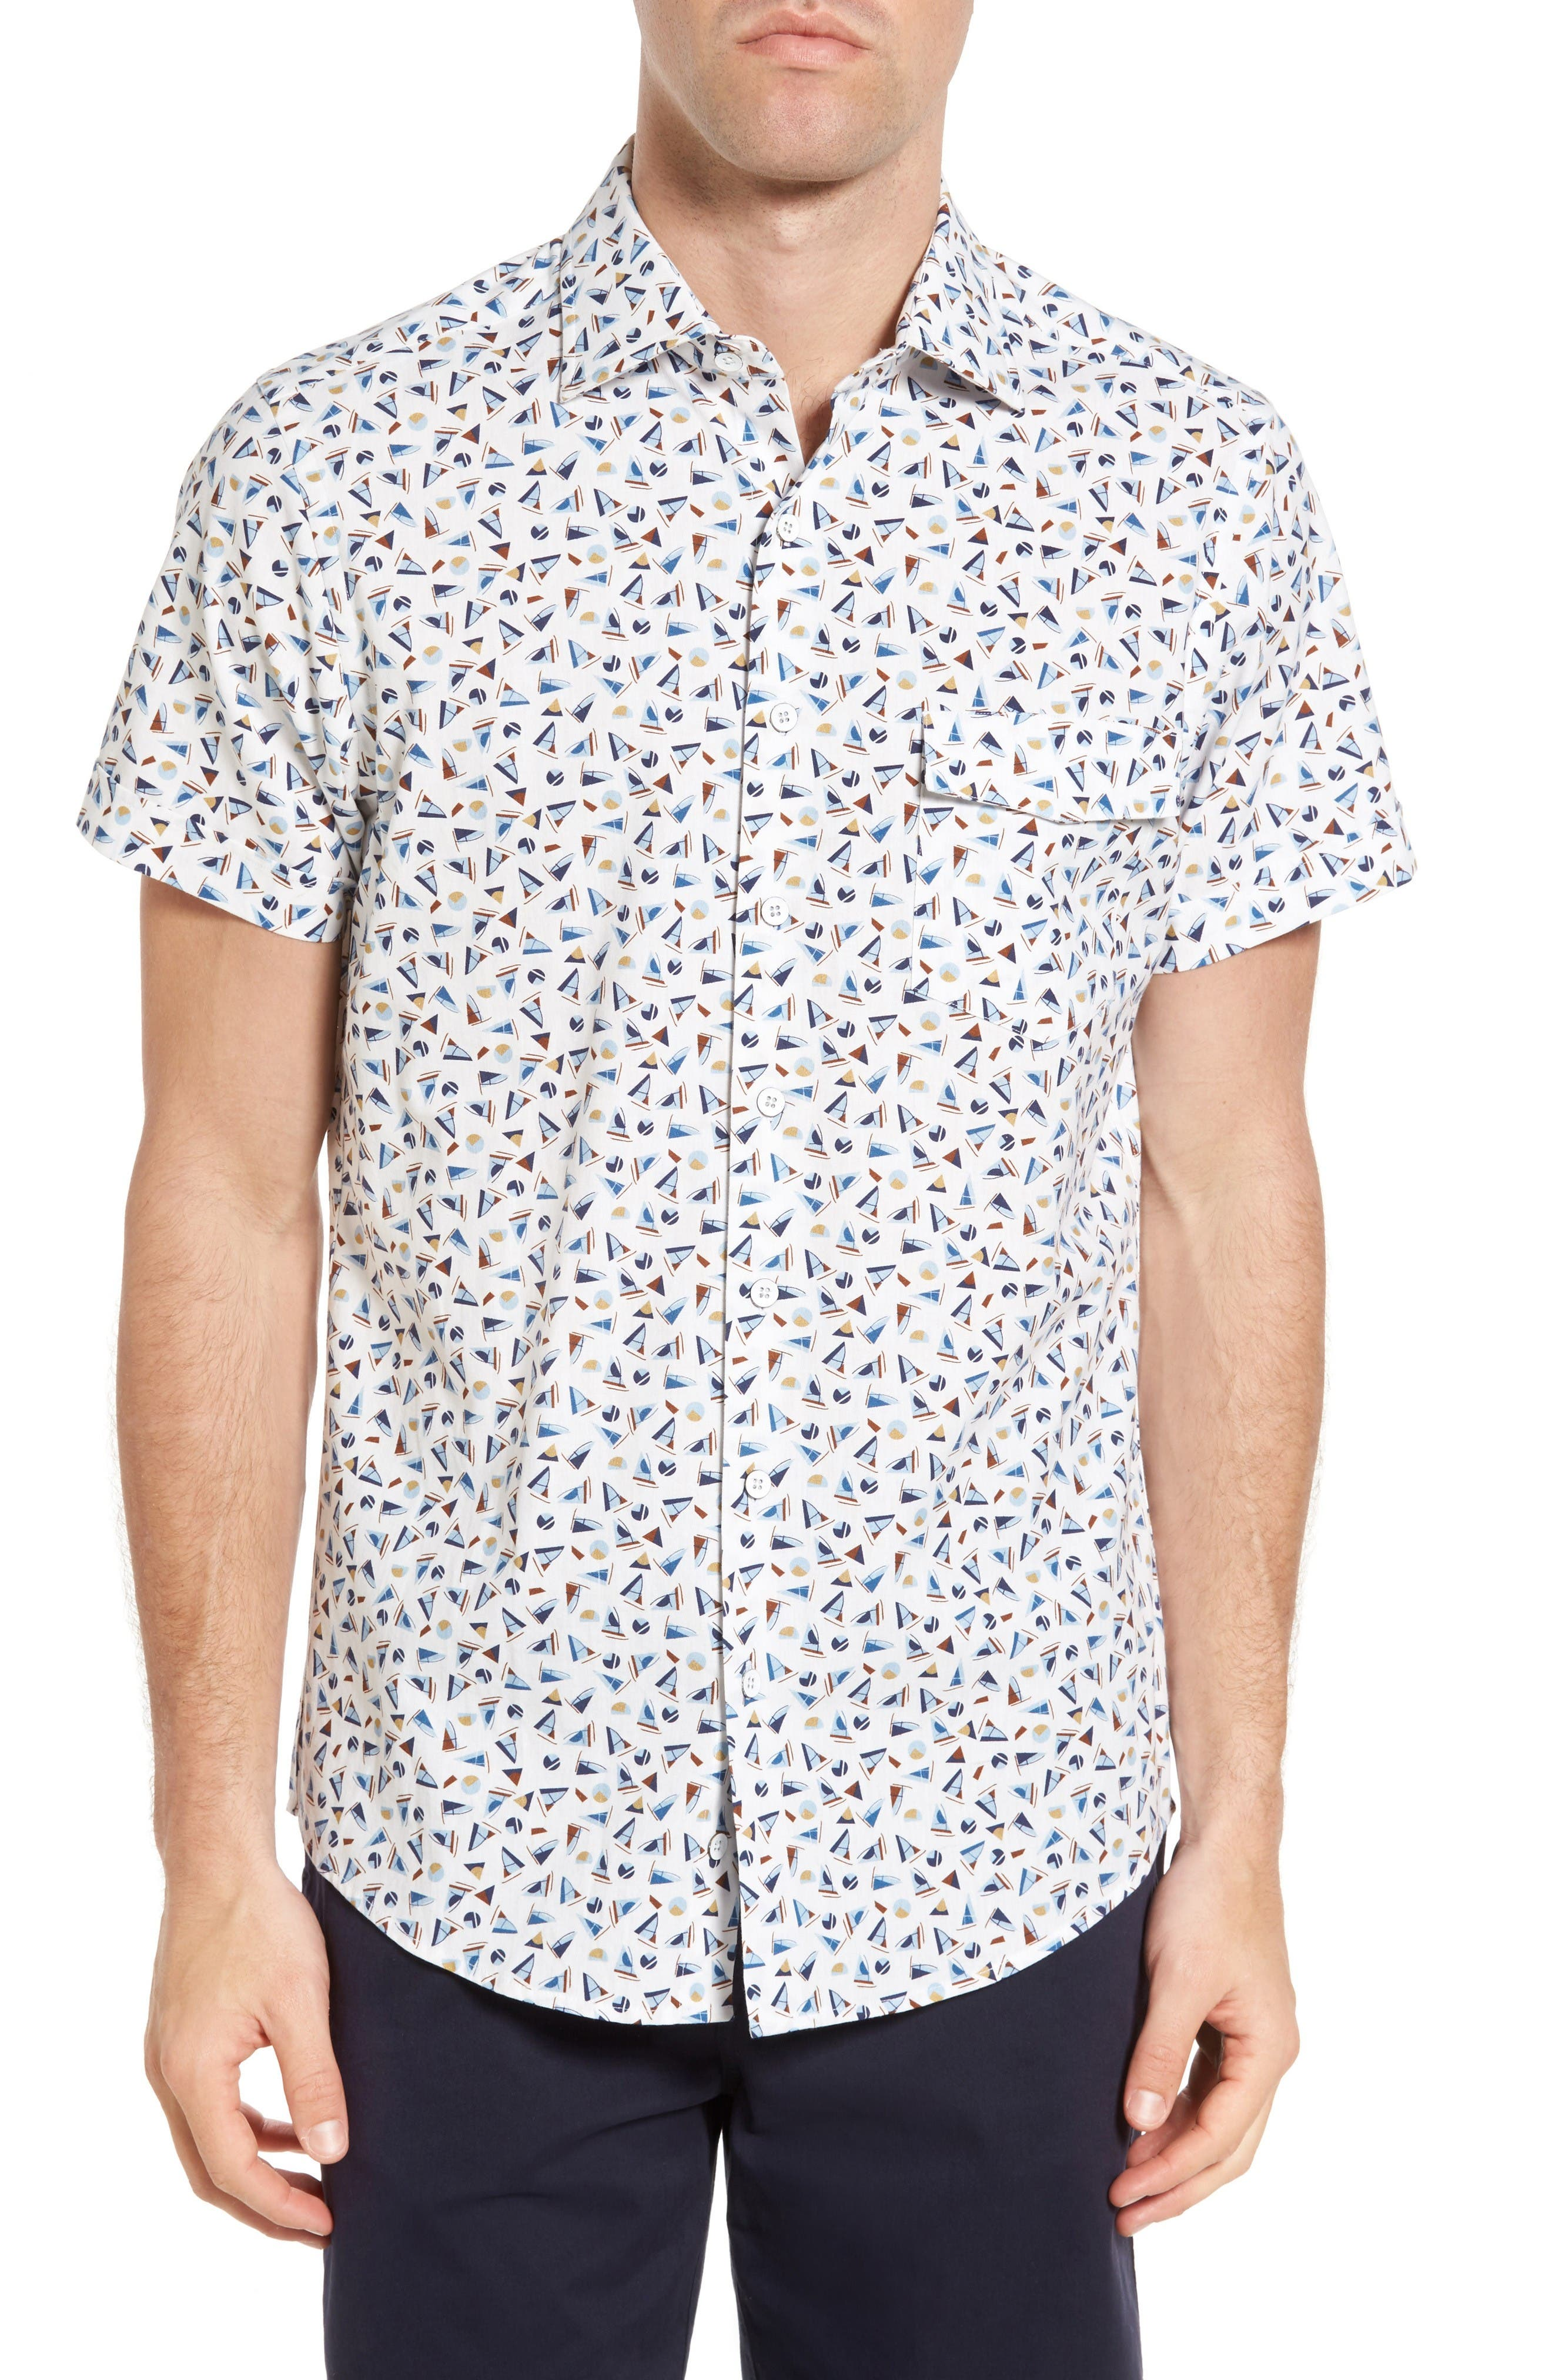 Alternate Image 1 Selected - Rodd & Gunn Coal Island Original Fit Print Sport Shirt